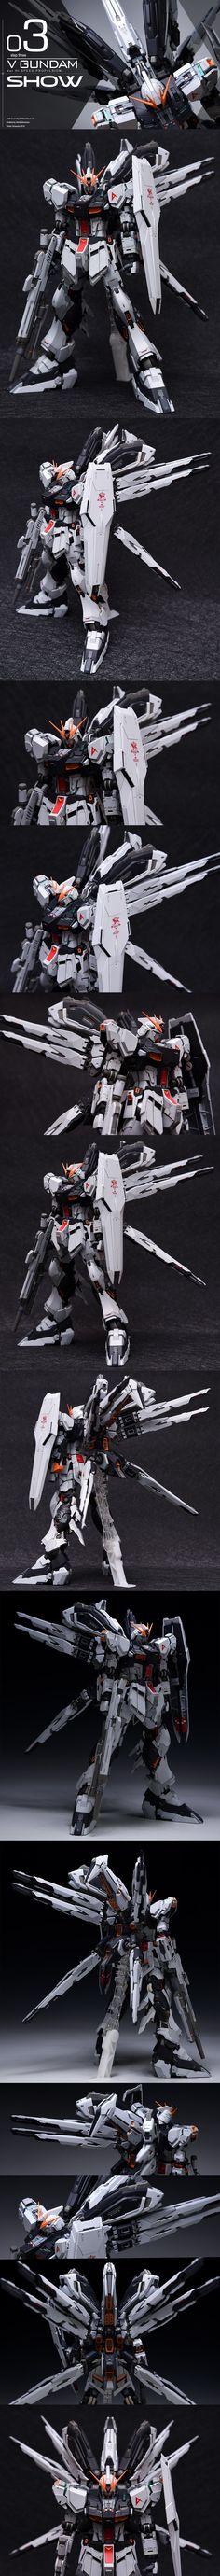 Gunpla Custom, Custom Gundam, Vintage Robots, Sci Fi Models, Gundam Model, Mobile Suit, Plastic Models, Artwork, Toys